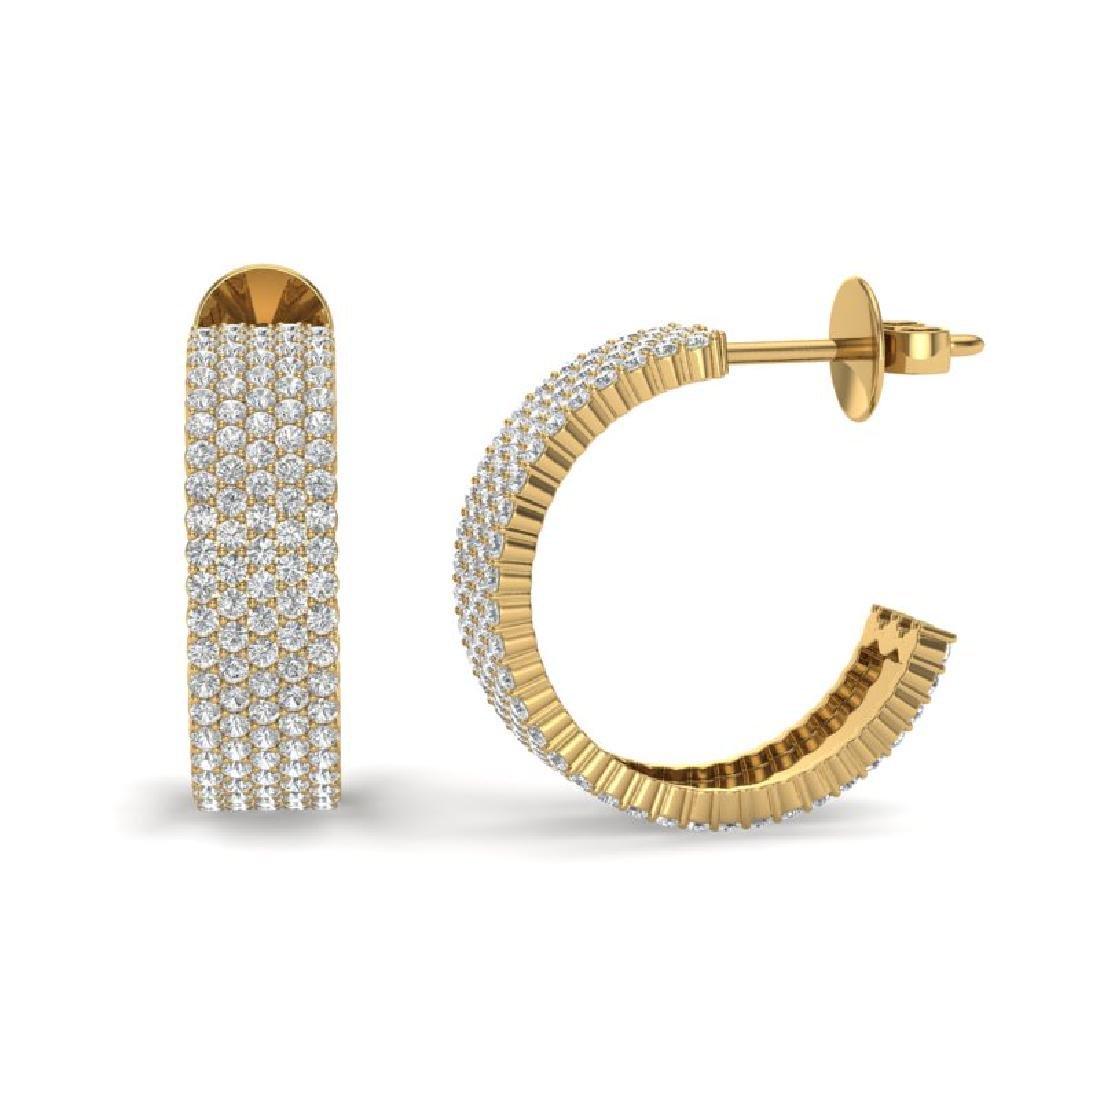 4.50 CTW Micro Pave VS/SI Diamond Earrings 14K Yellow - 2